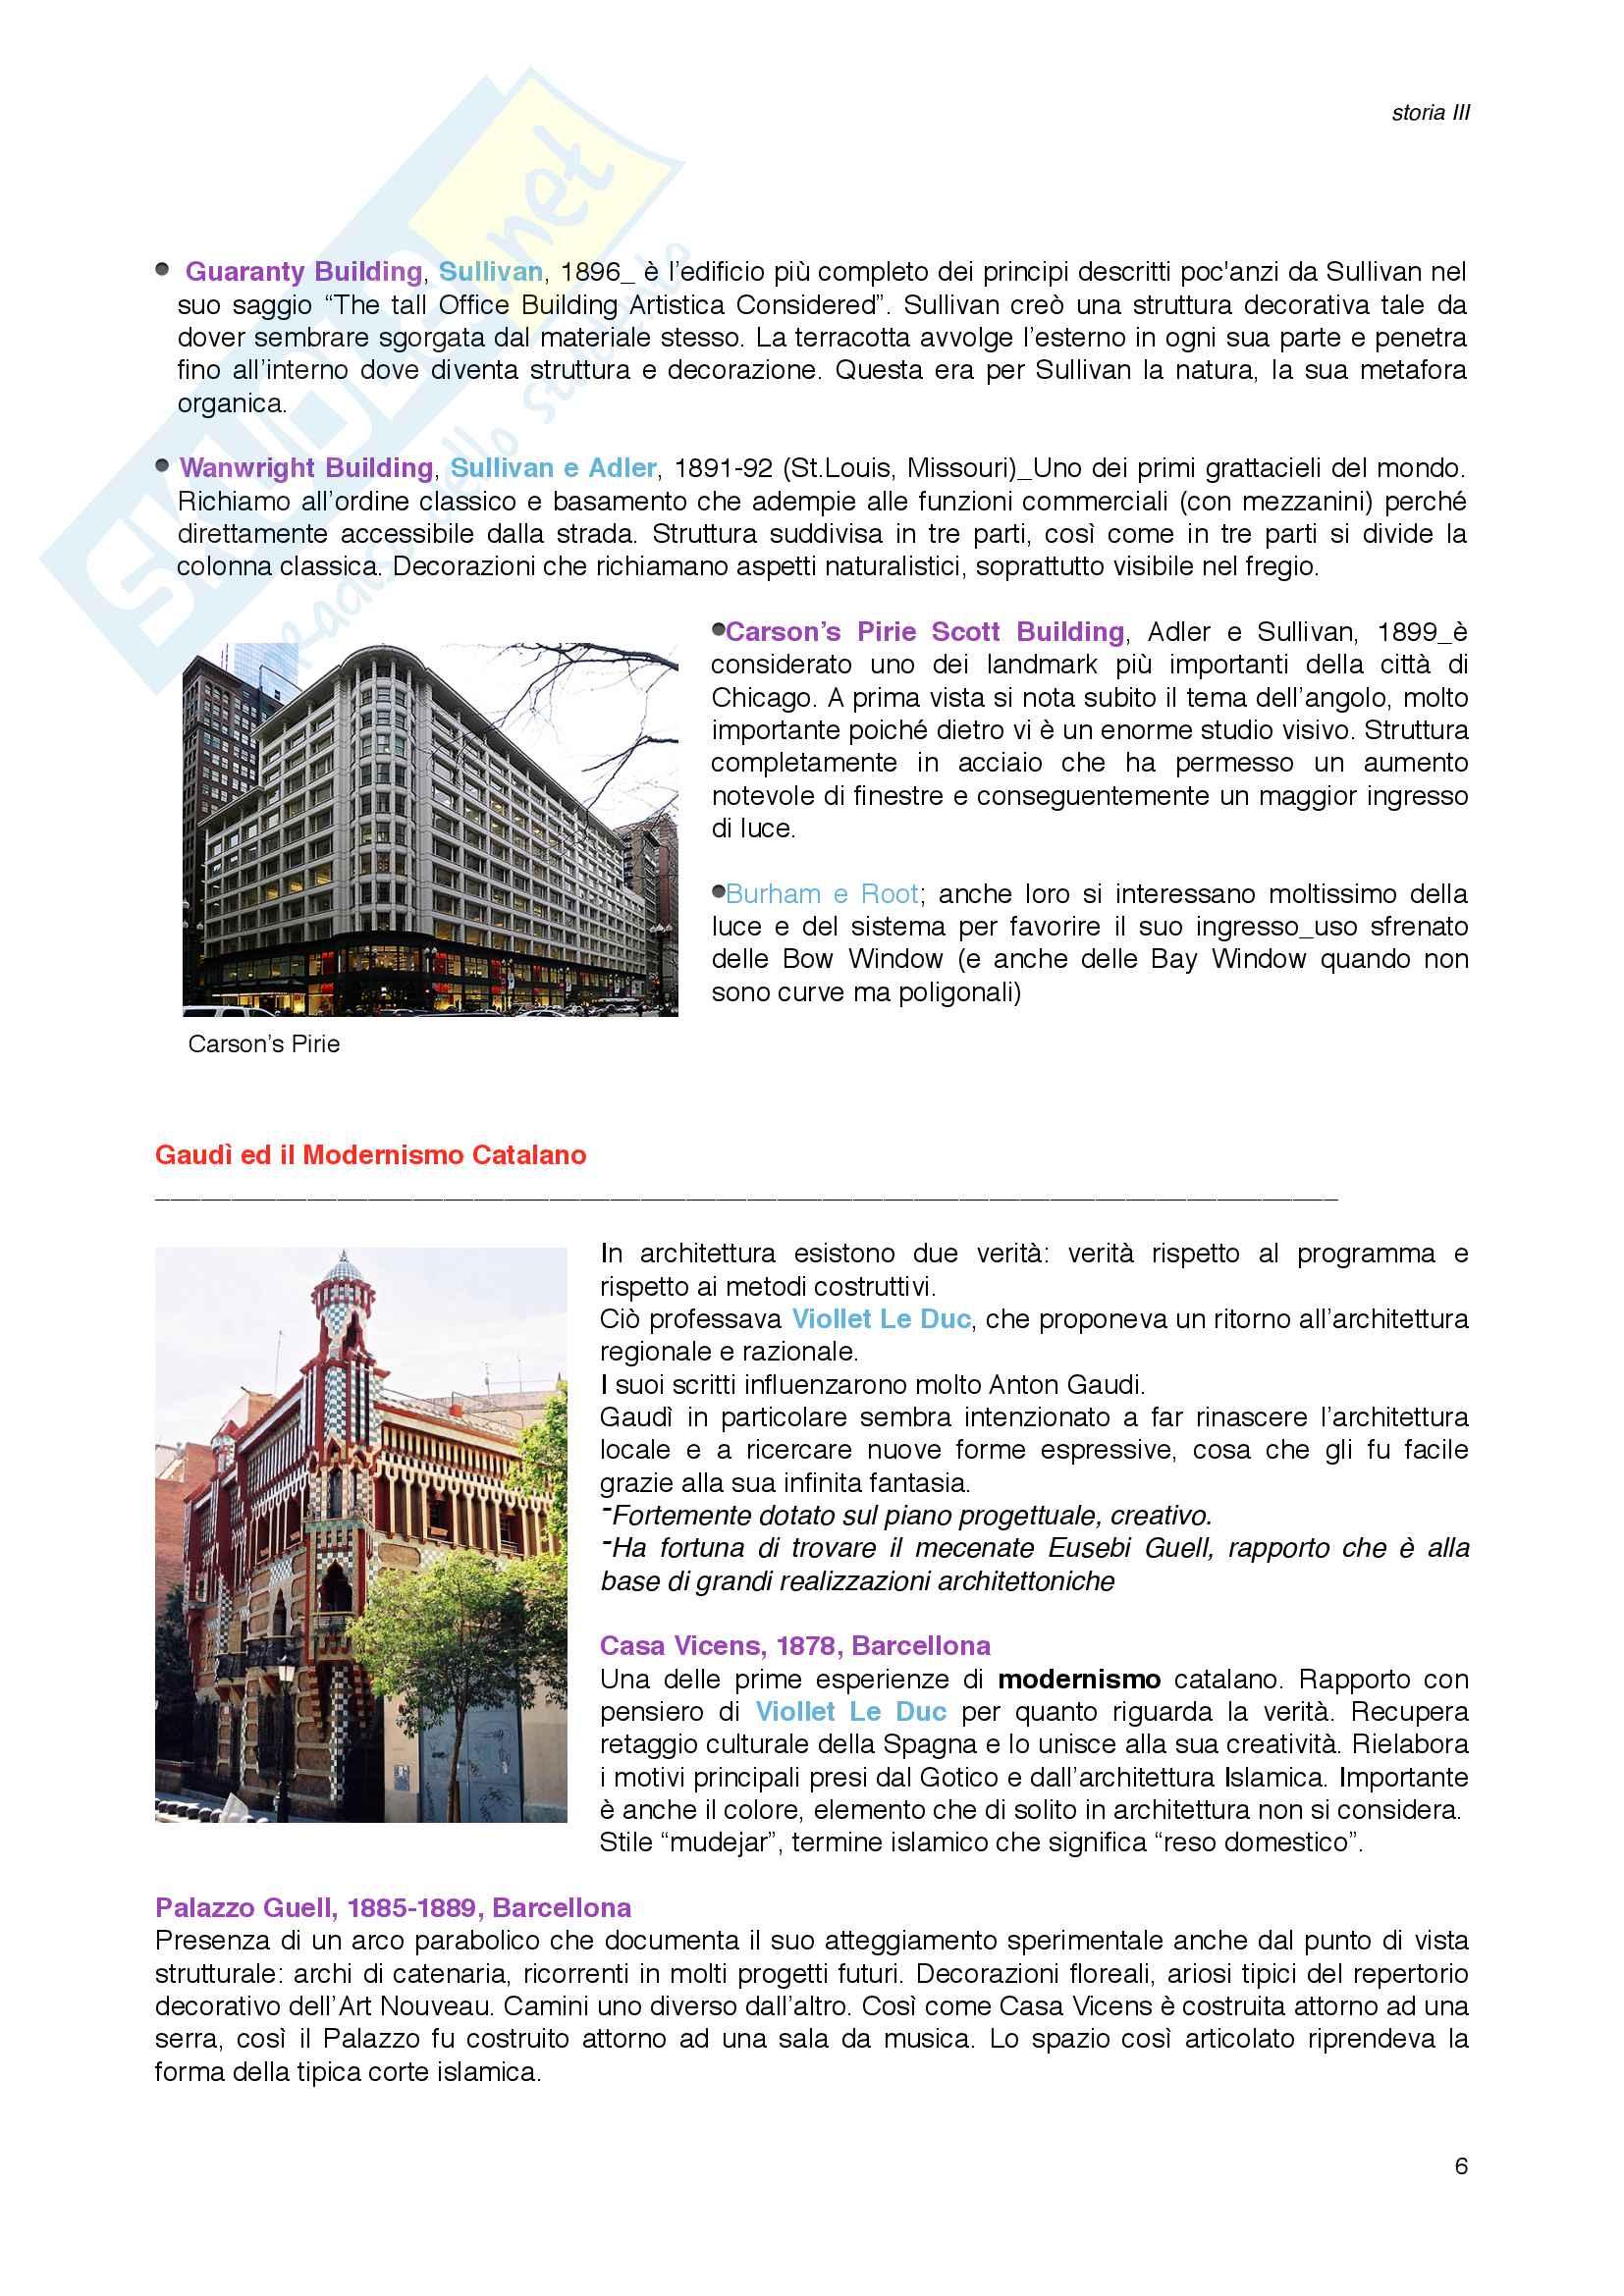 Storia III_Architettura Moderna Pag. 6